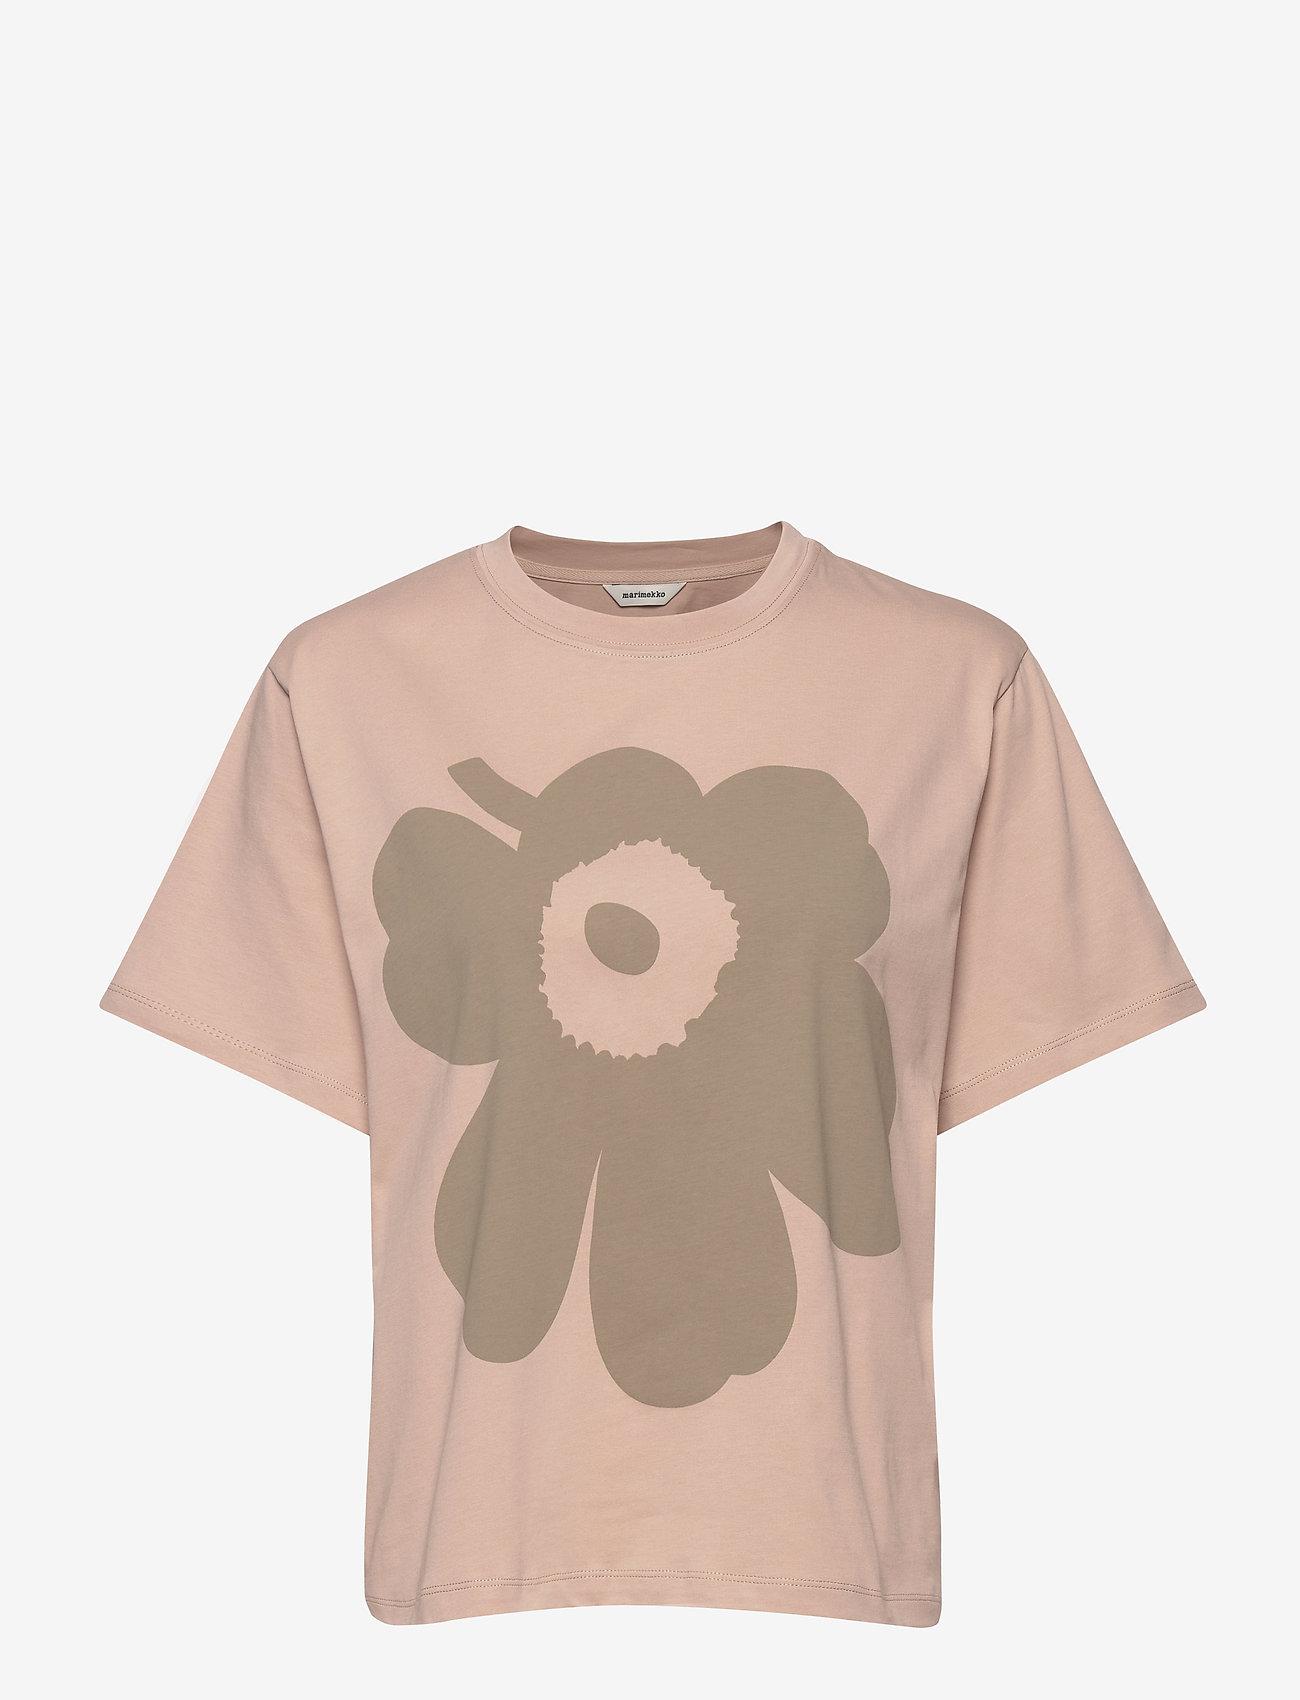 Marimekko - VAIKUTUS UNIKKO T-SHIRT - logo t-shirts - beige, green - 1